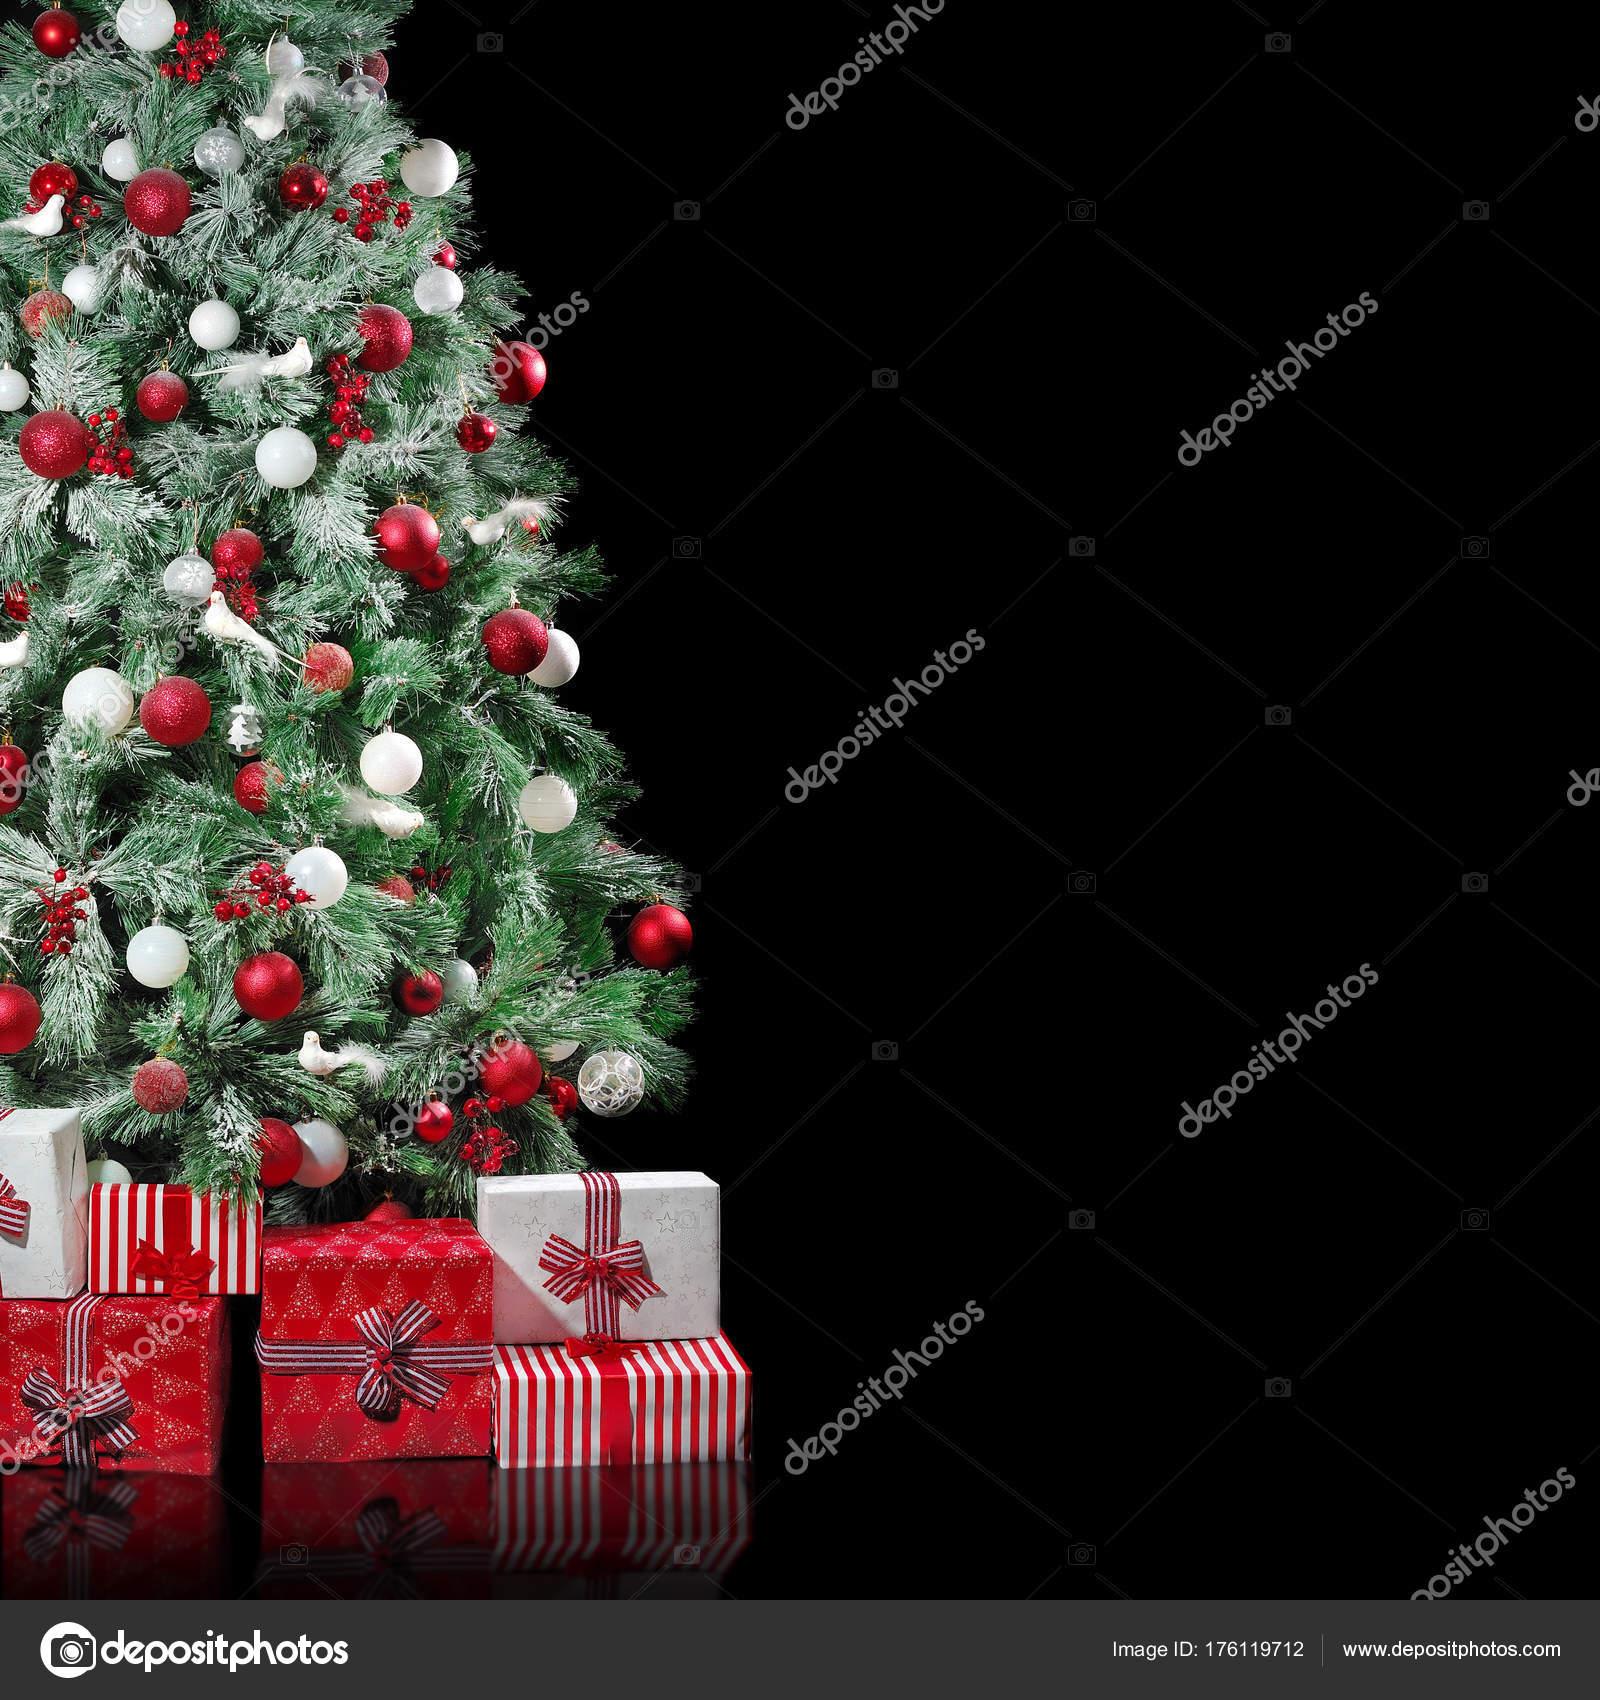 Big Christmas Tree Red White Decorations Presents Boxes Isolated Black Stock Photo Image By C Iagodina 176119712